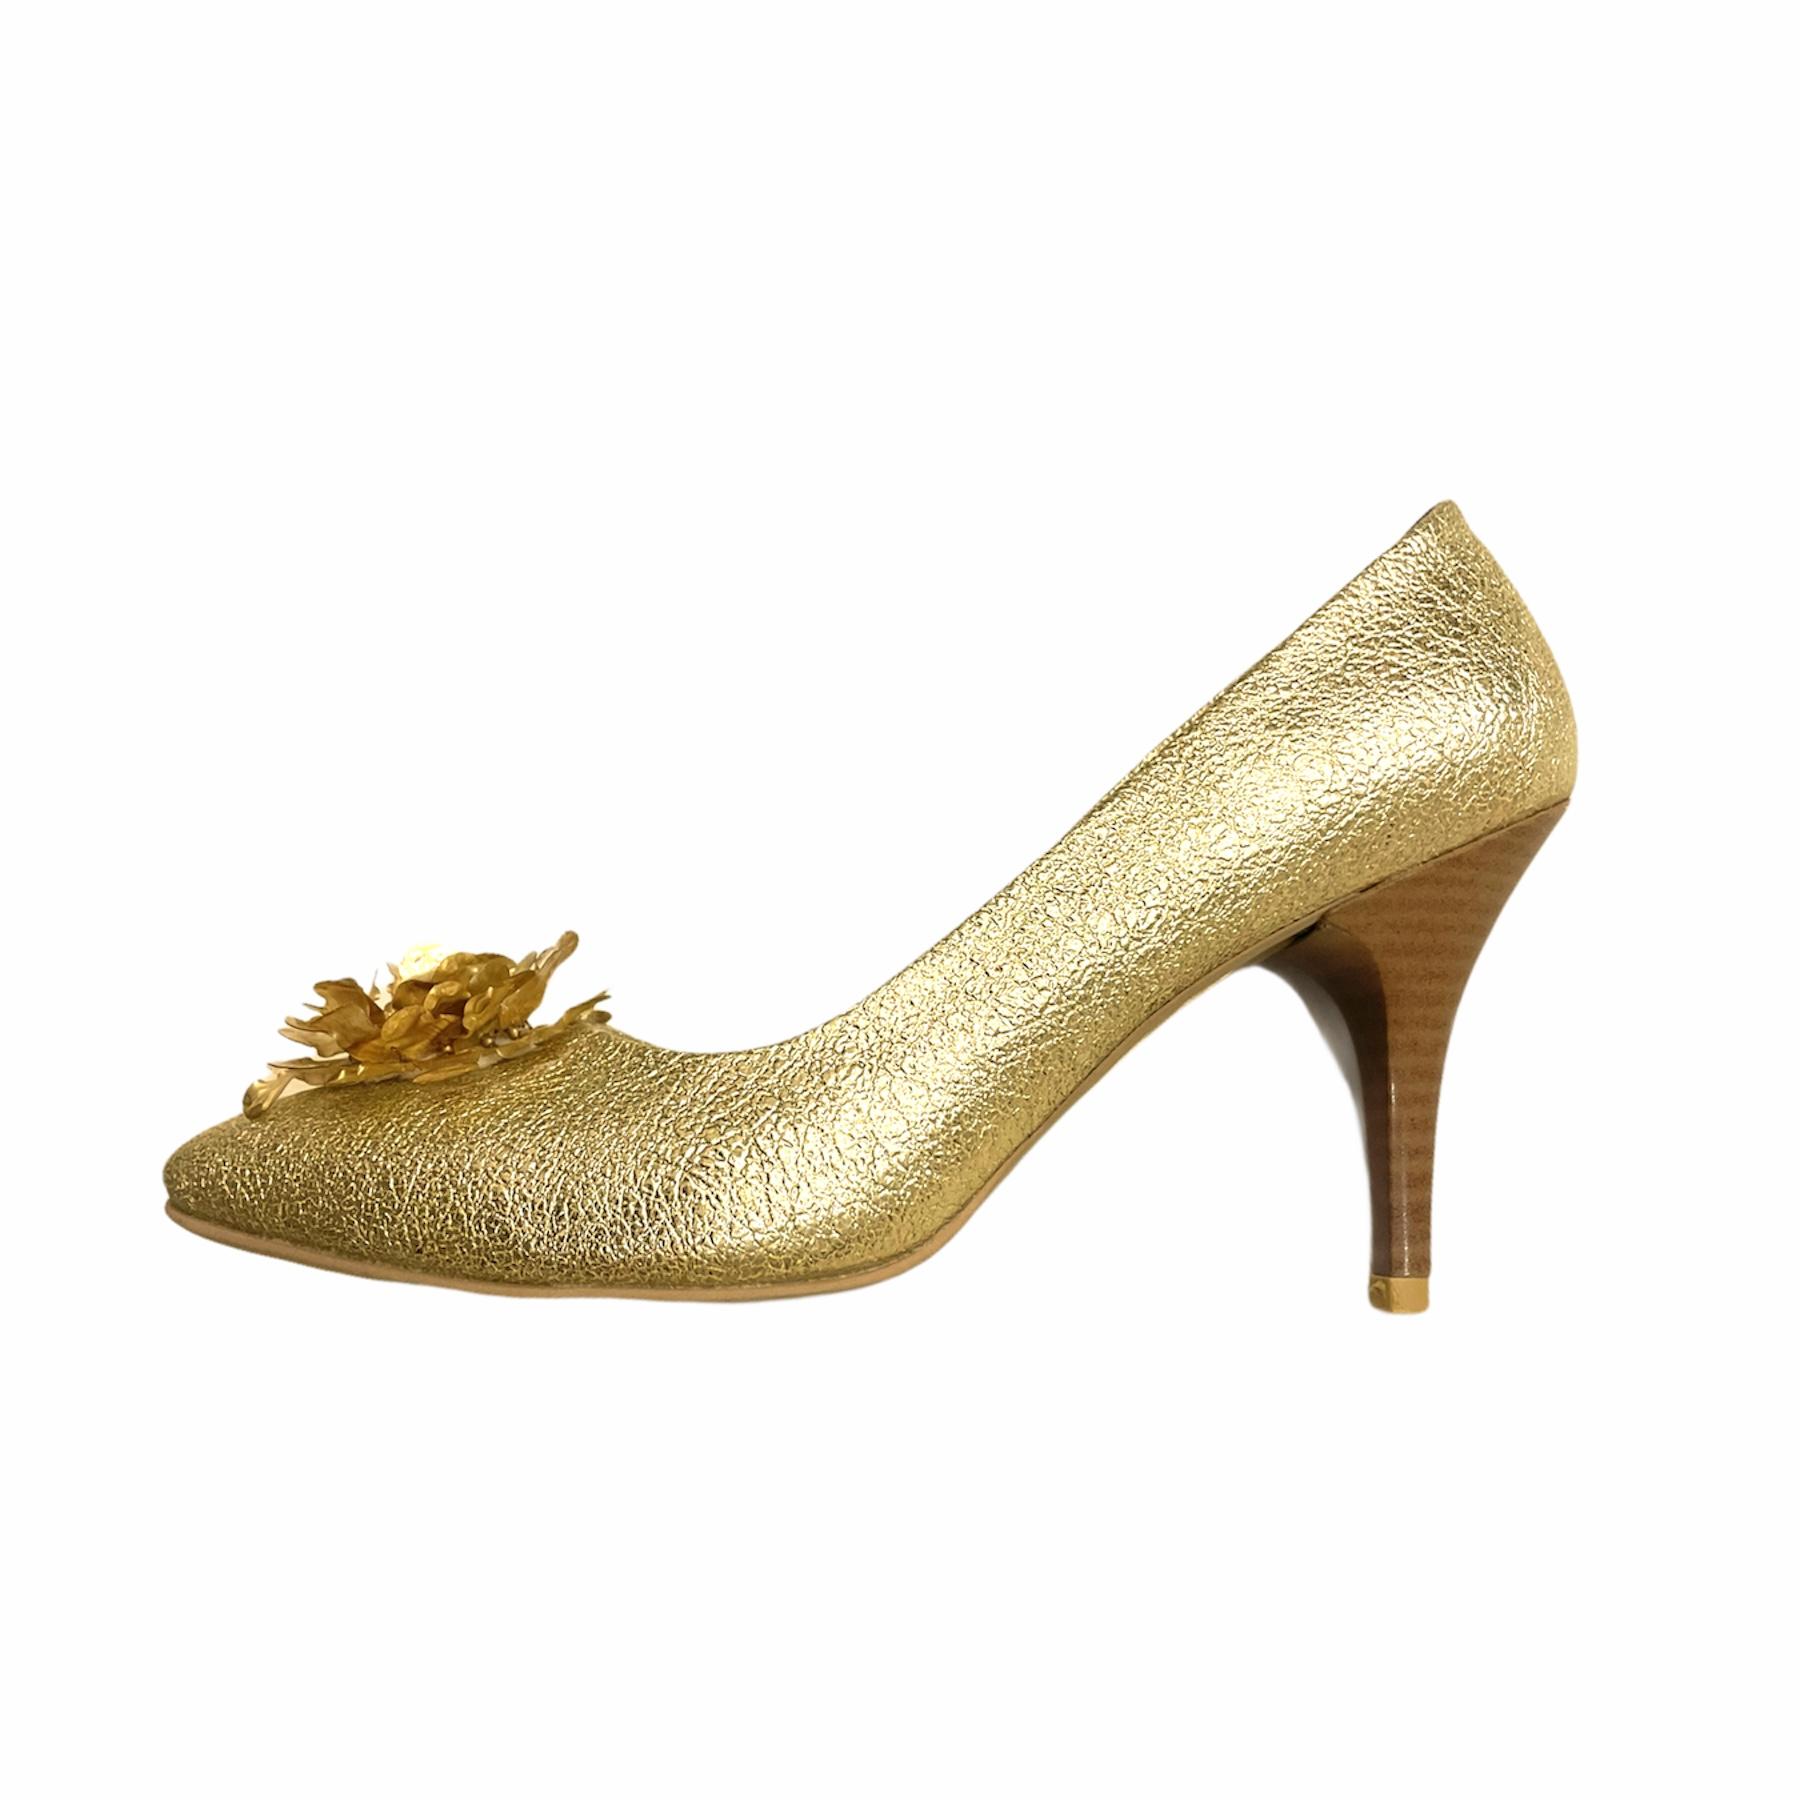 کفش زنانه کد ۱۴۸